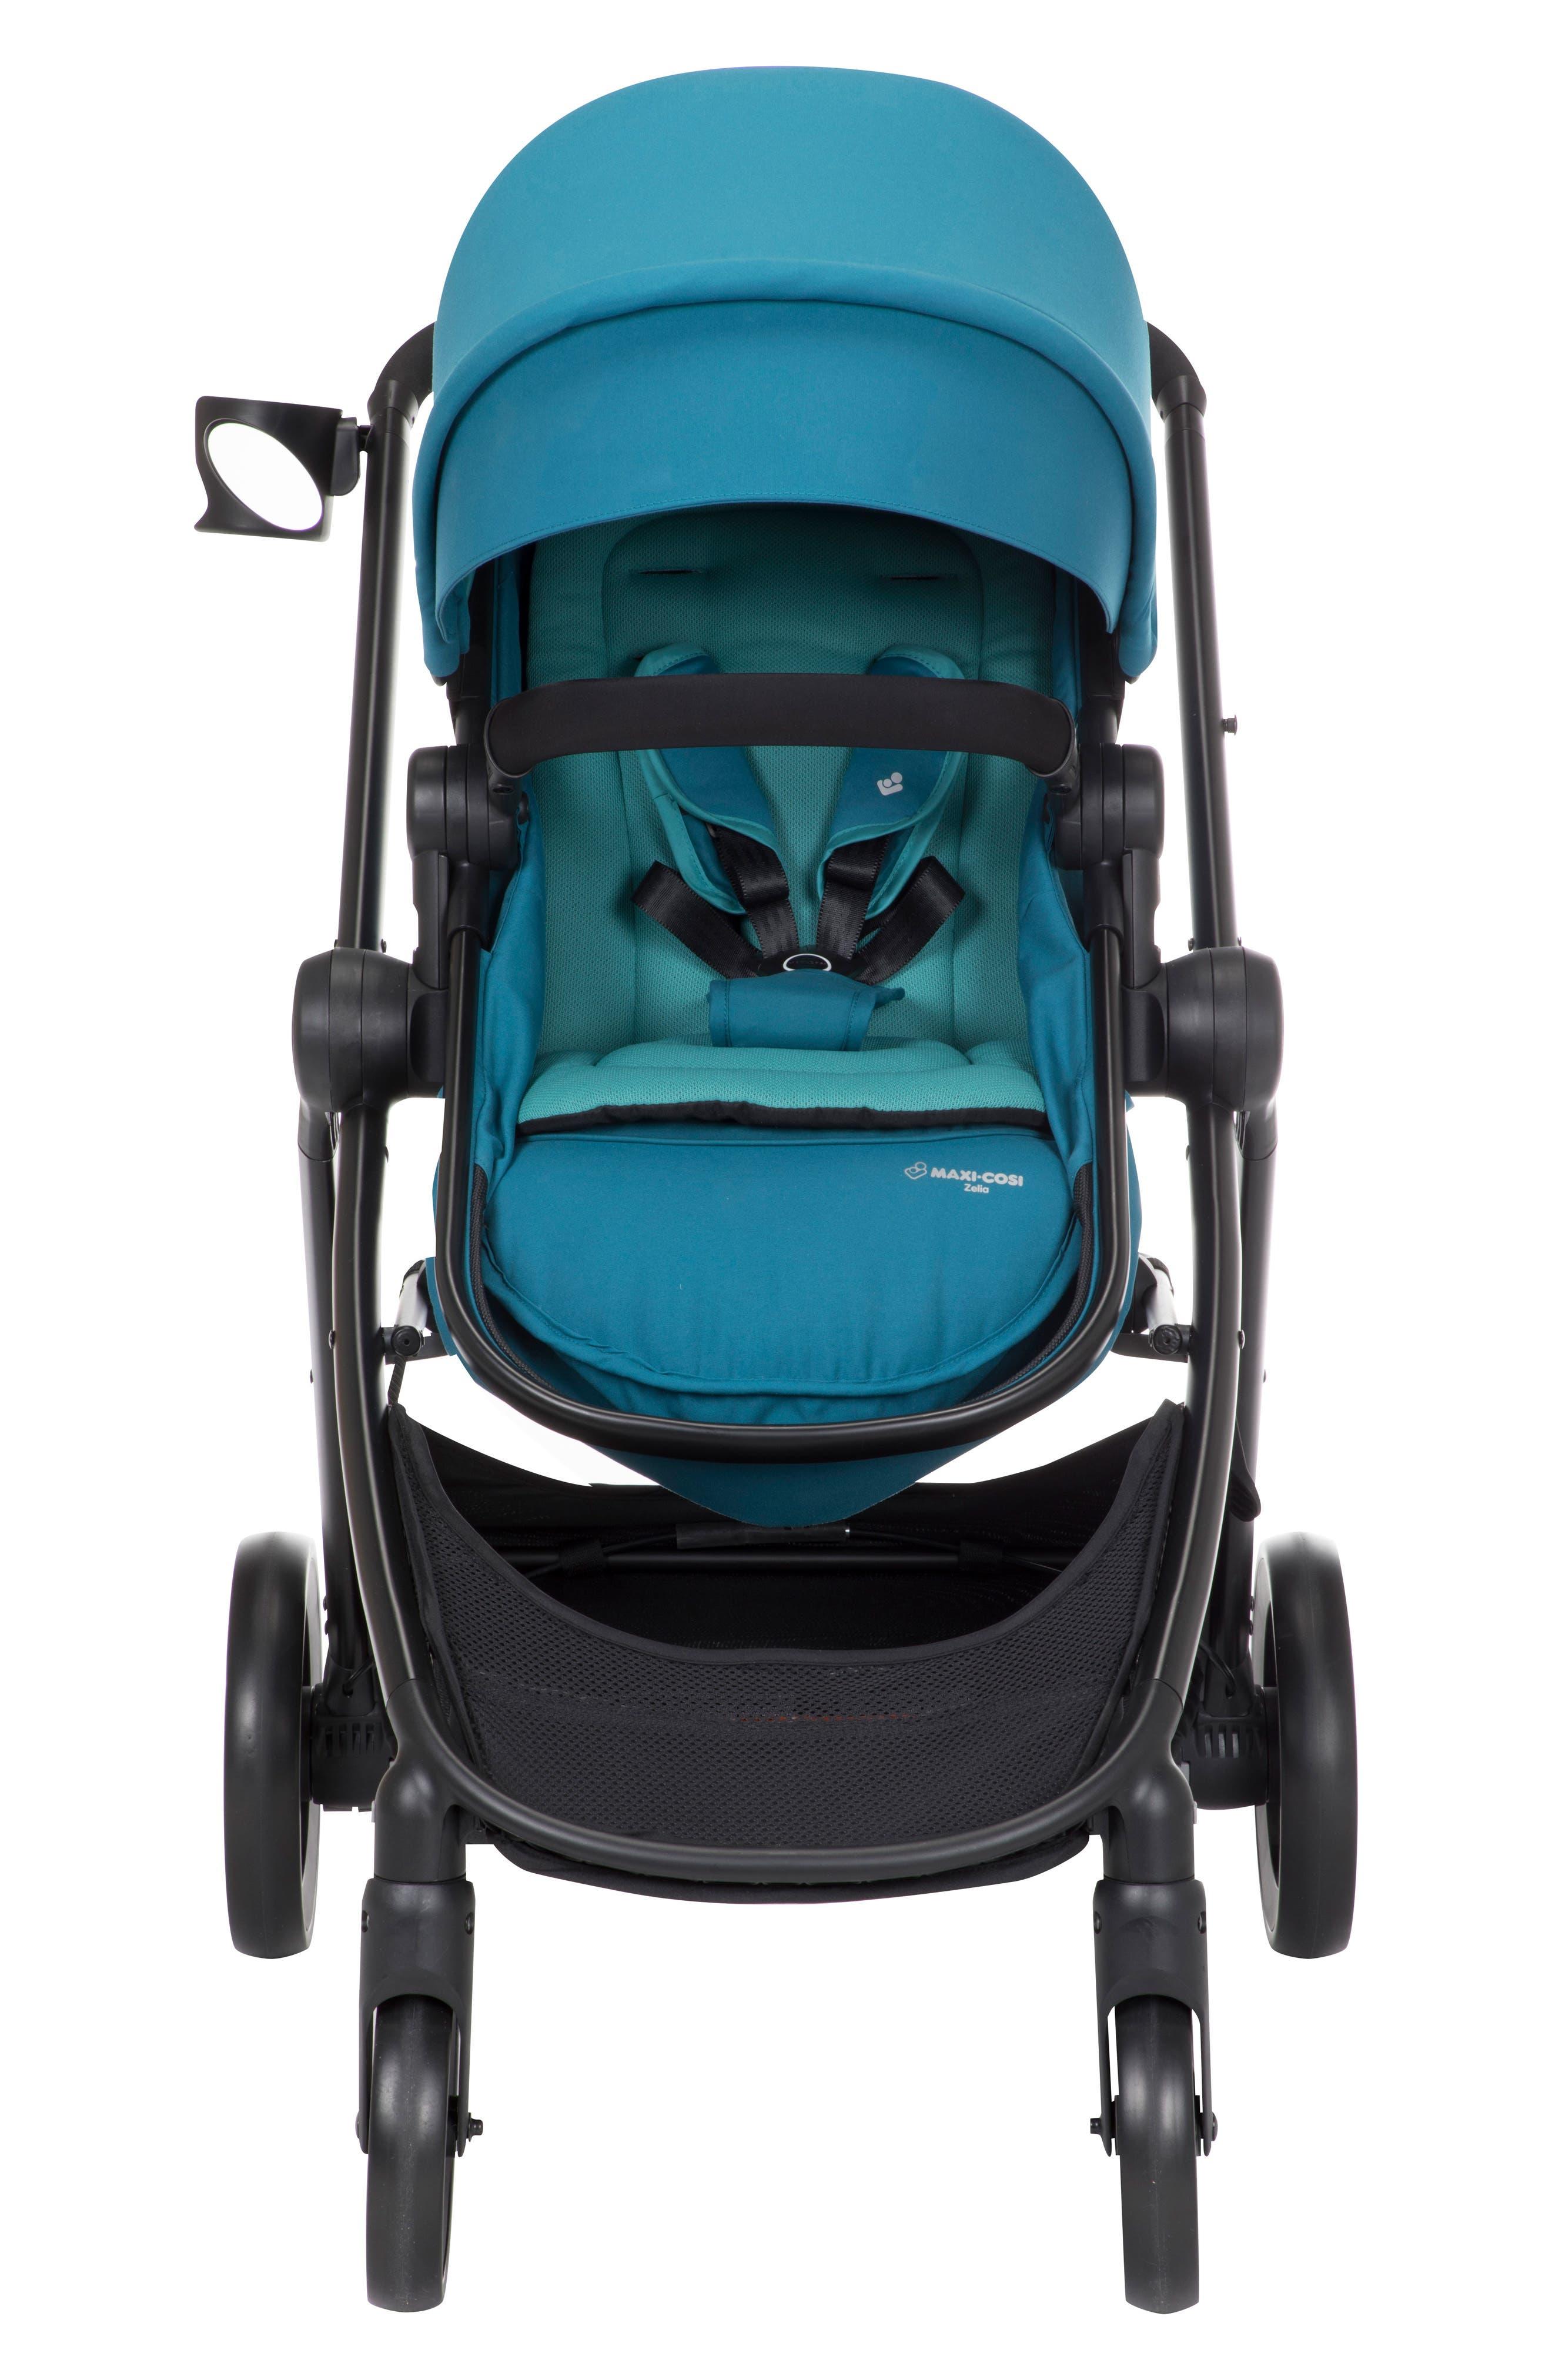 5-1 Mico 30 Infant Car Seat & Zelia Stroller Modular Travel System,                             Main thumbnail 1, color,                             EMERALD TIDE